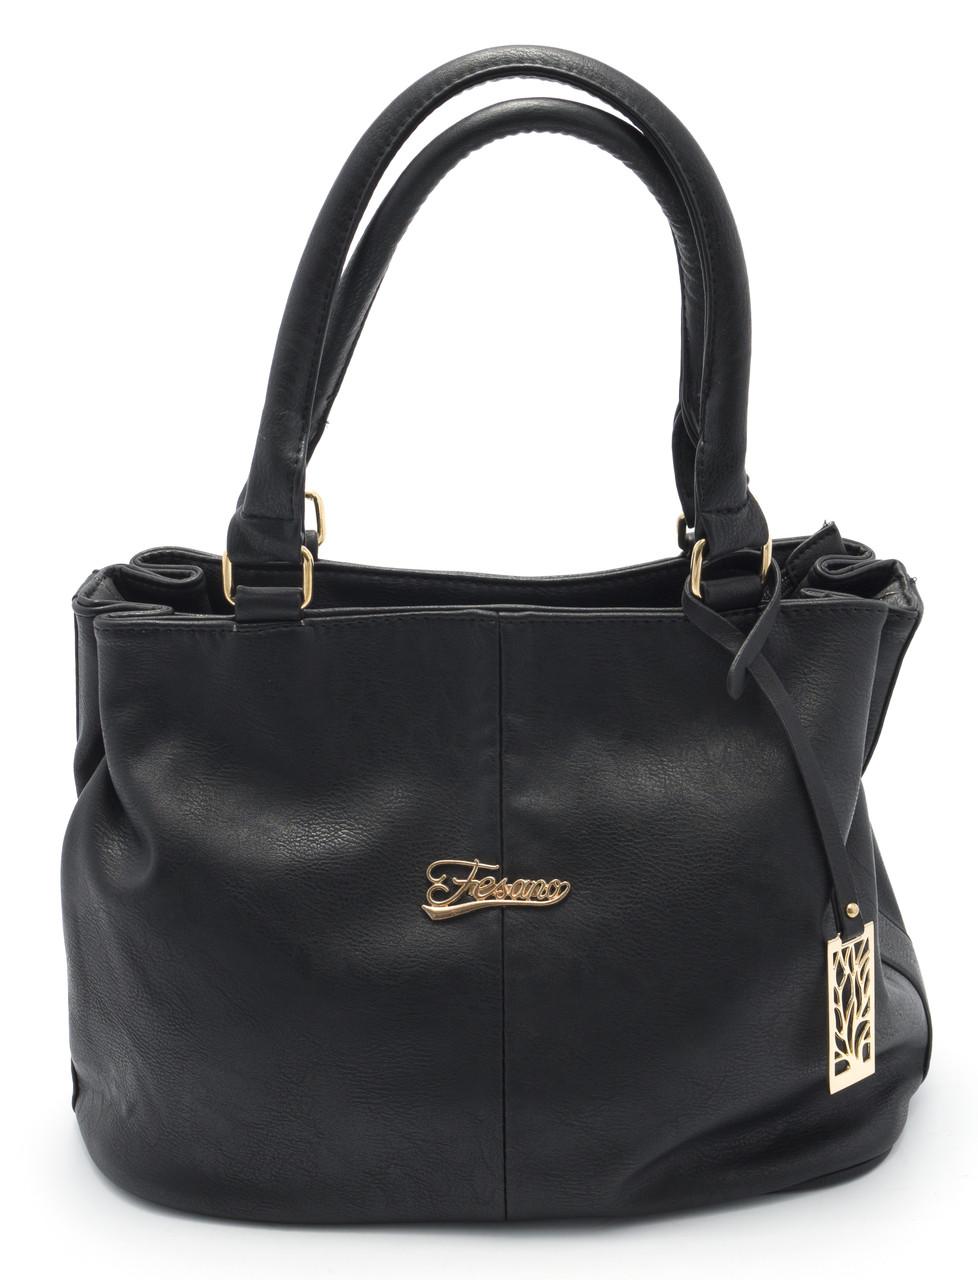 Симпатичная женская черная сумка Б/Н art.2116